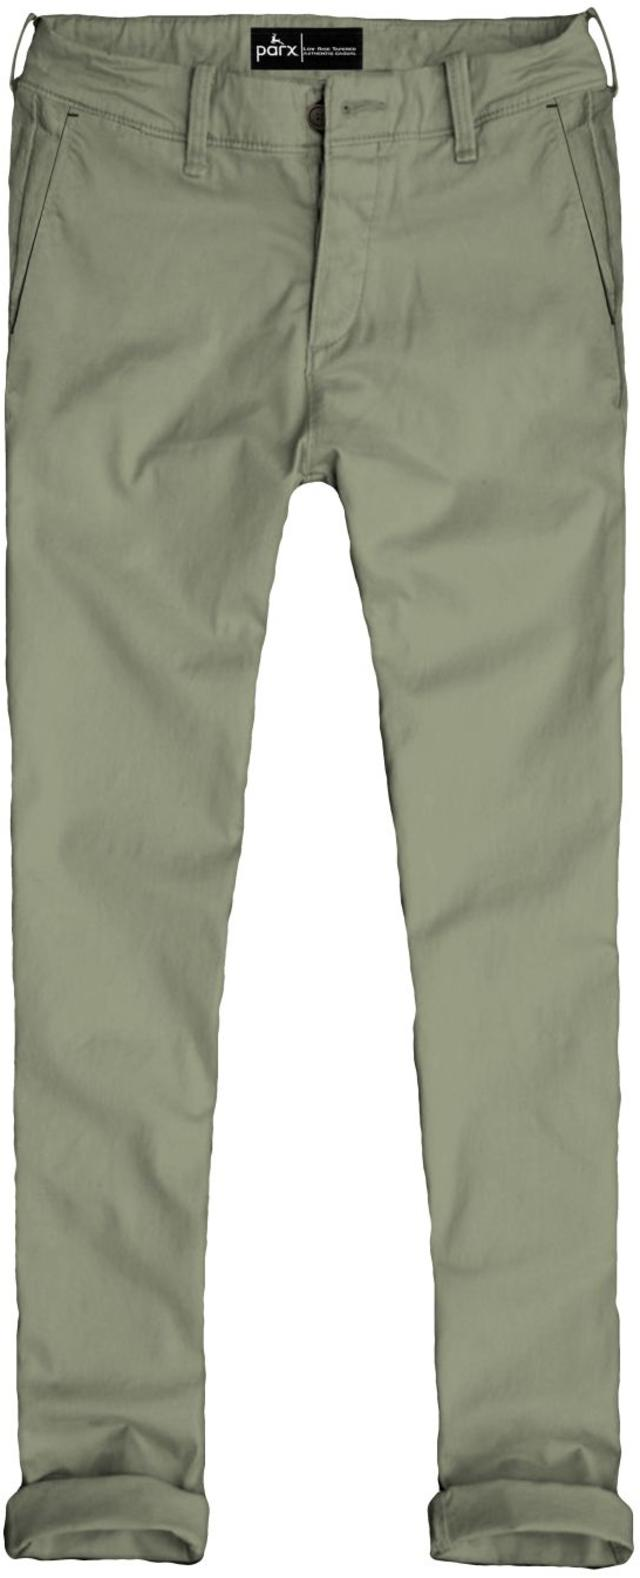 PARX | PARX Green Trouser